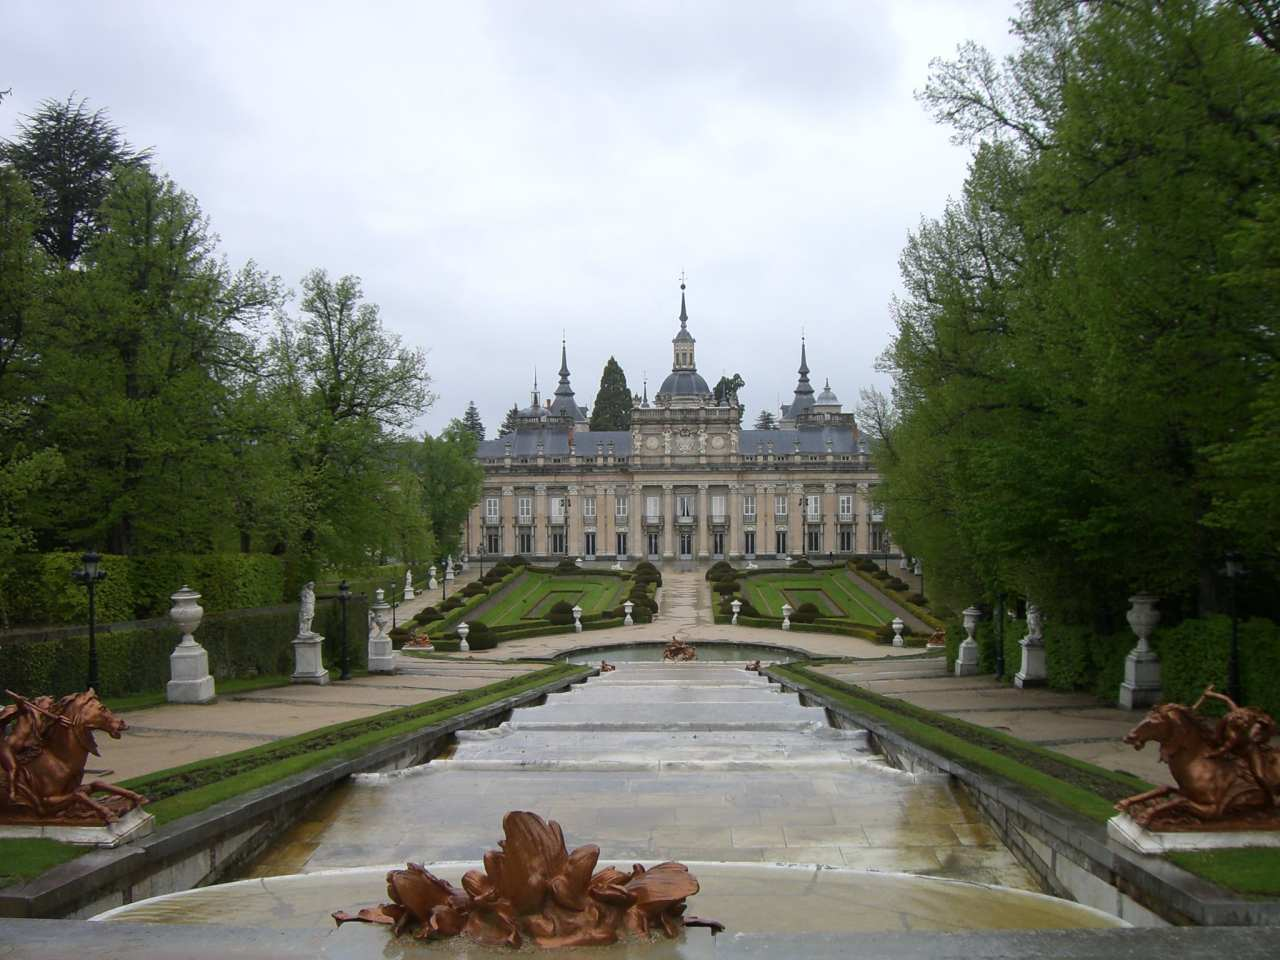 Royal Palace of La Granja de San Ildefonso, Segovia, Spain